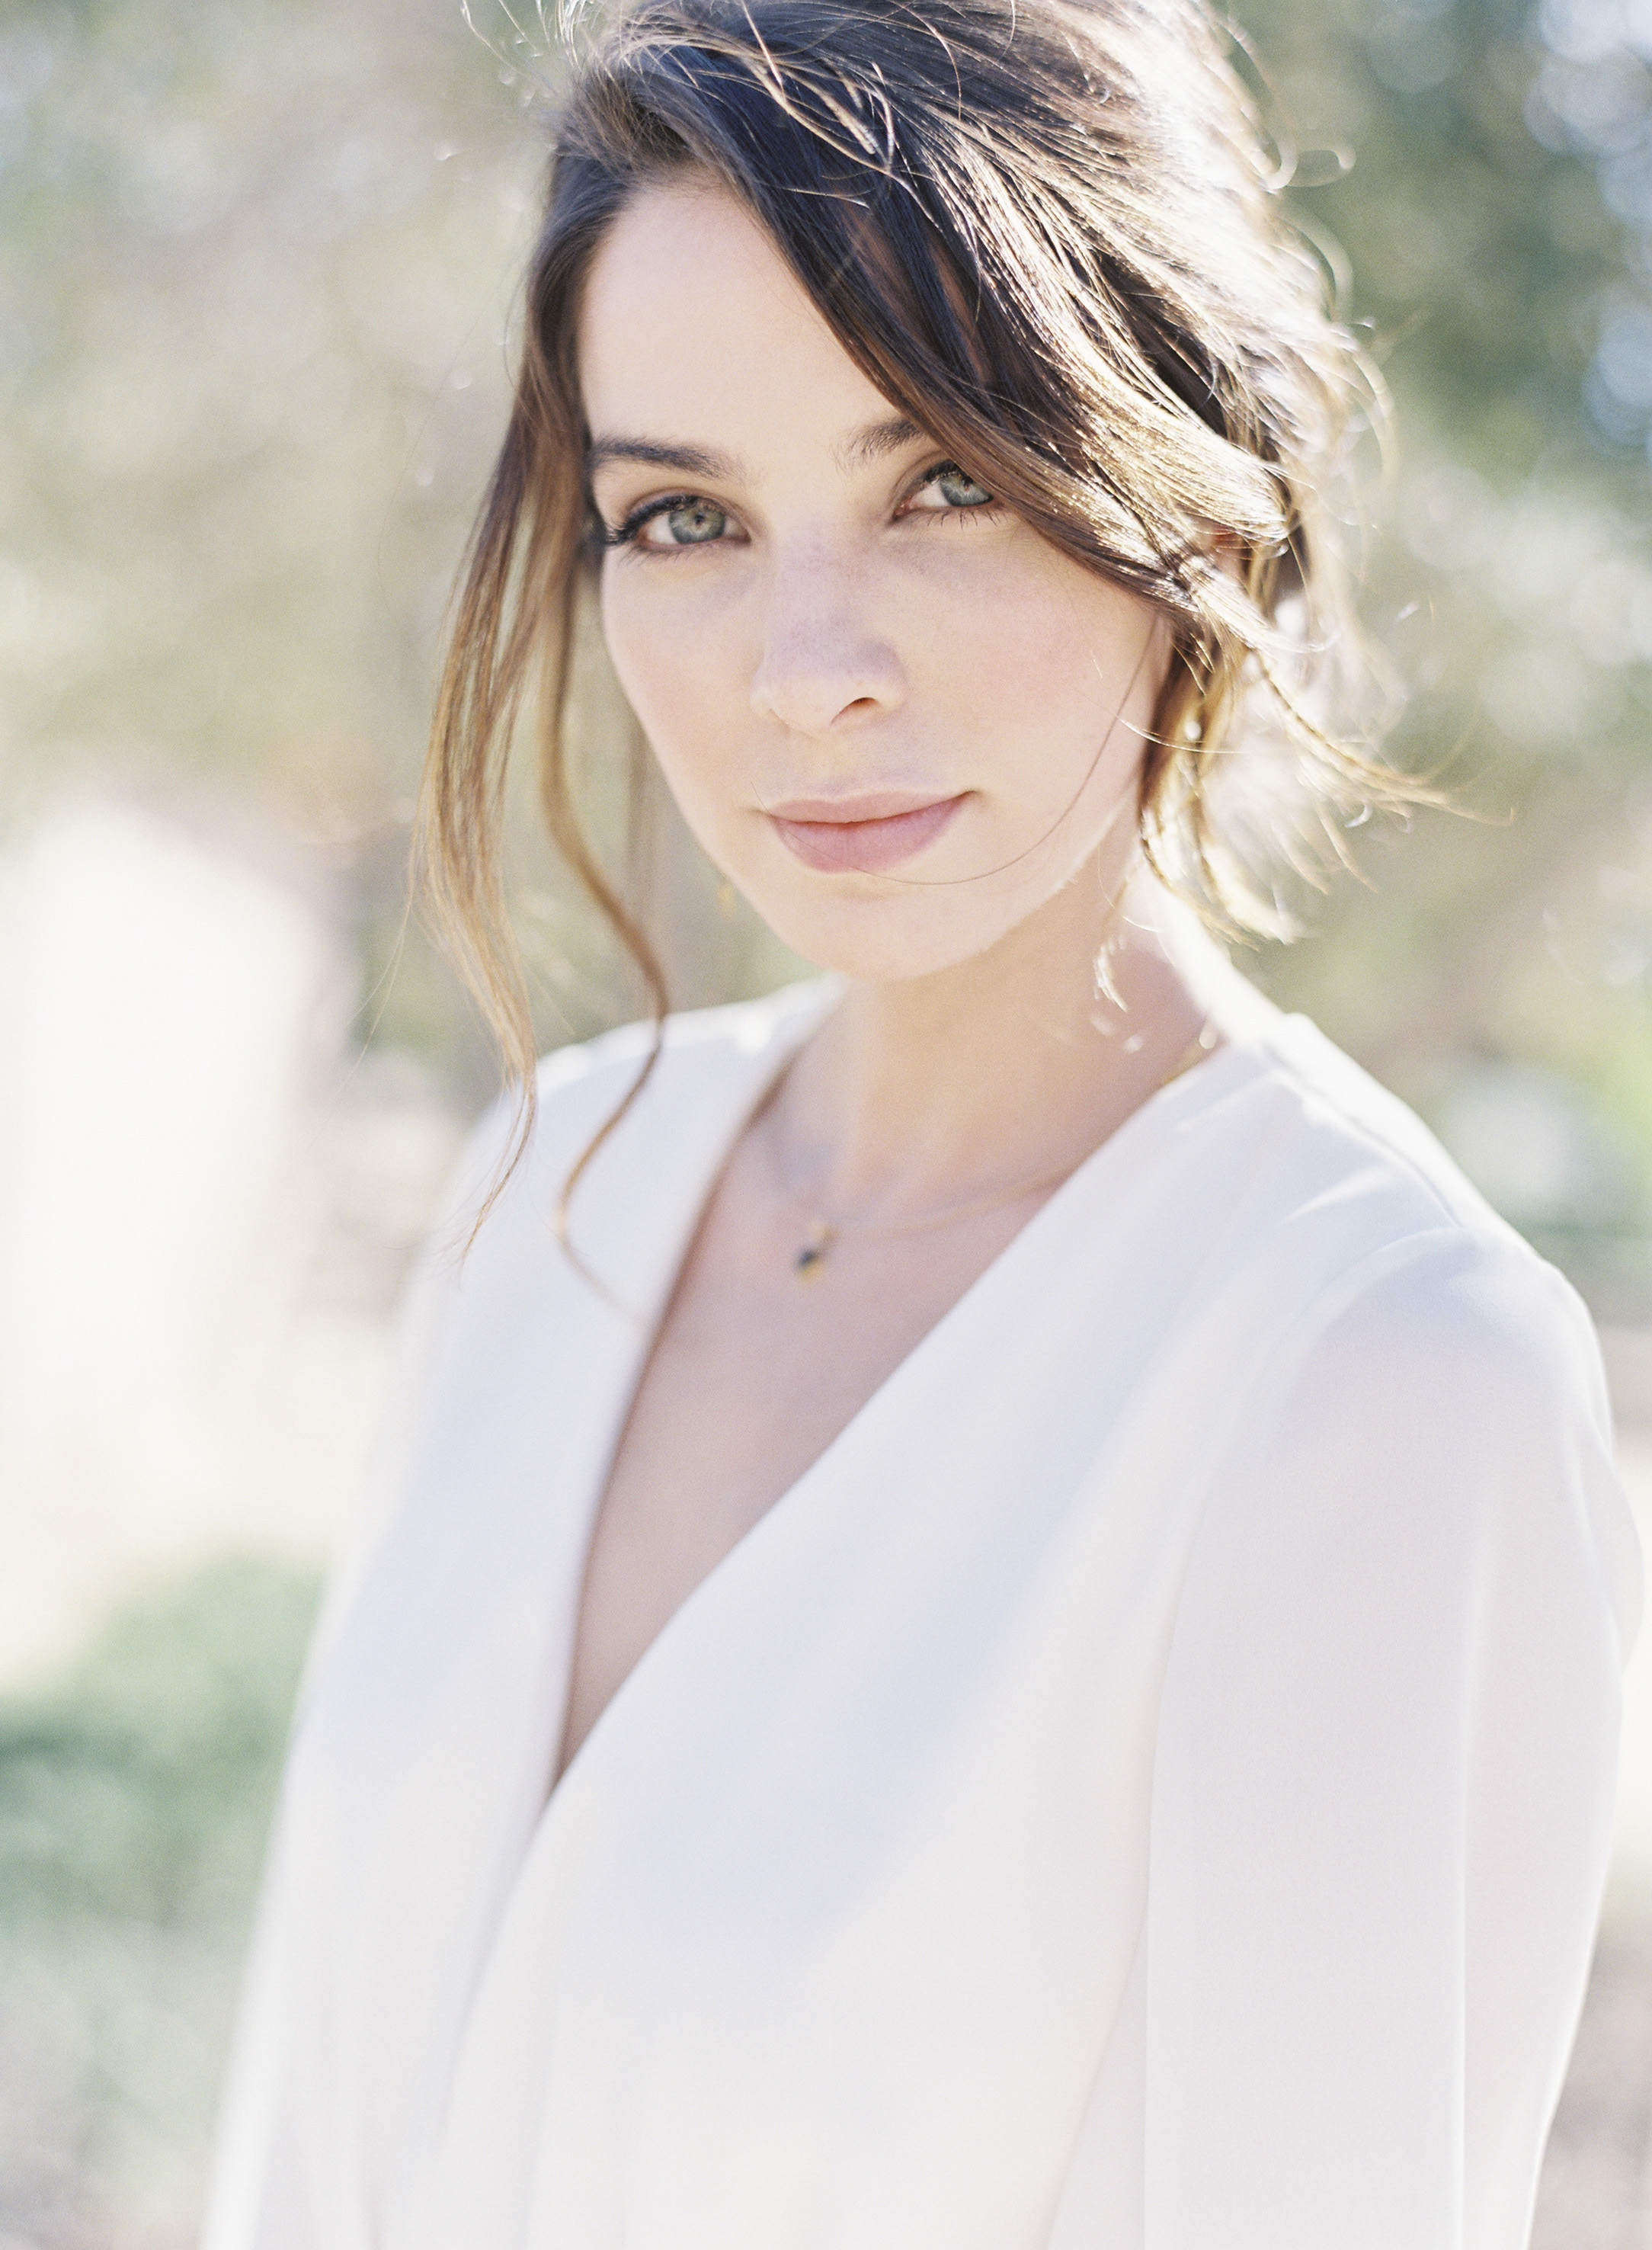 janetvilla.com | Janet Villa Hair and Makeup | Southern California Beauty Expert and Salon | Caroline Tran